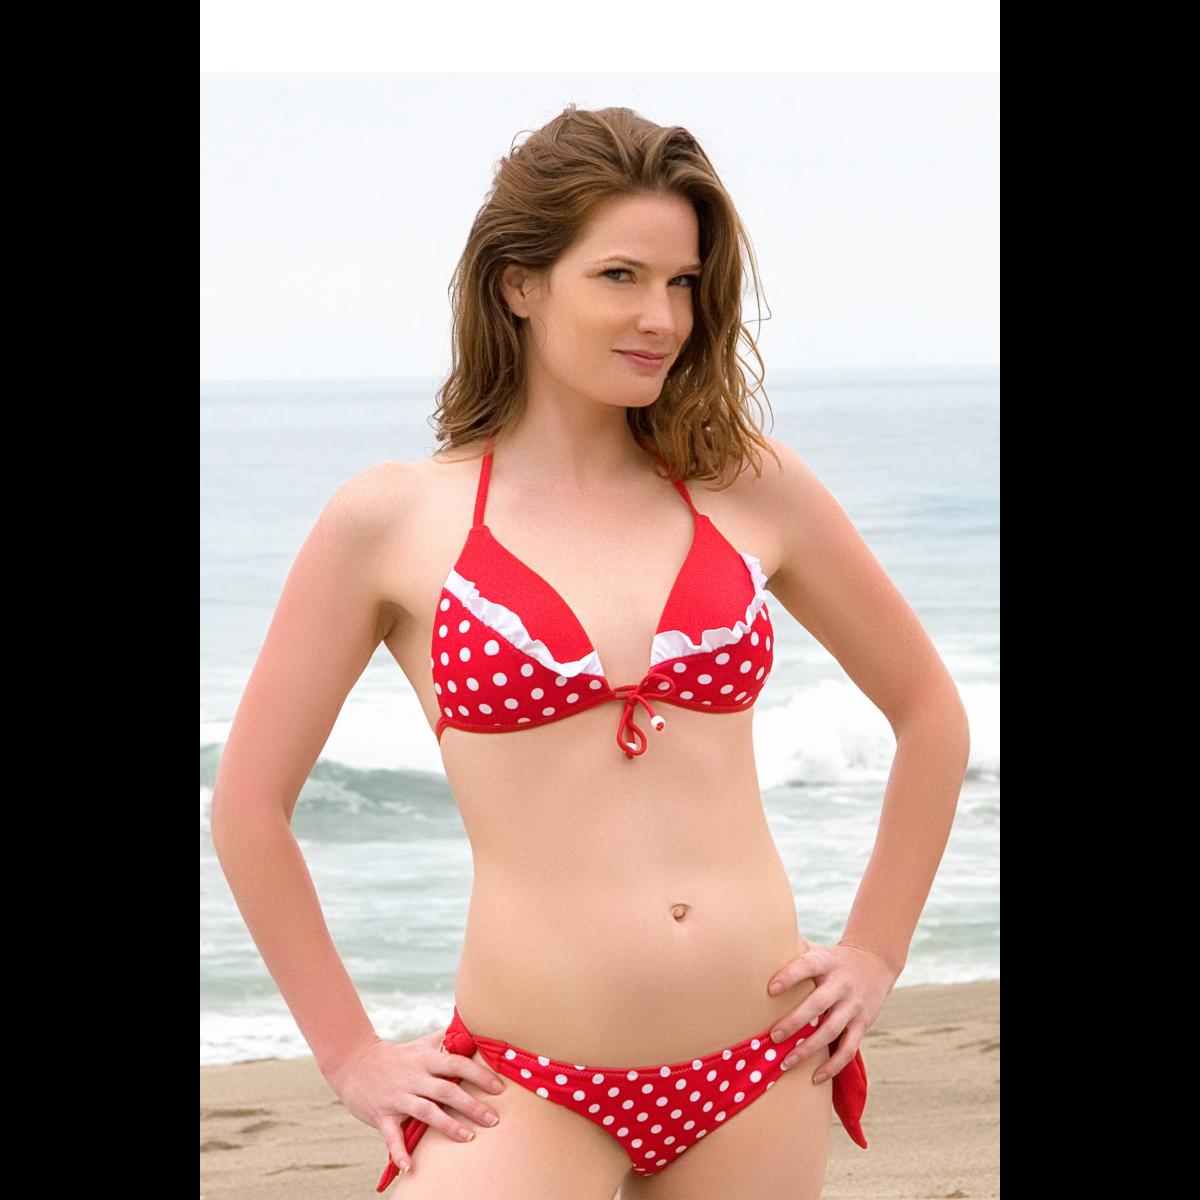 Szexi fodros háromszög bikini, fodros brazil tanga